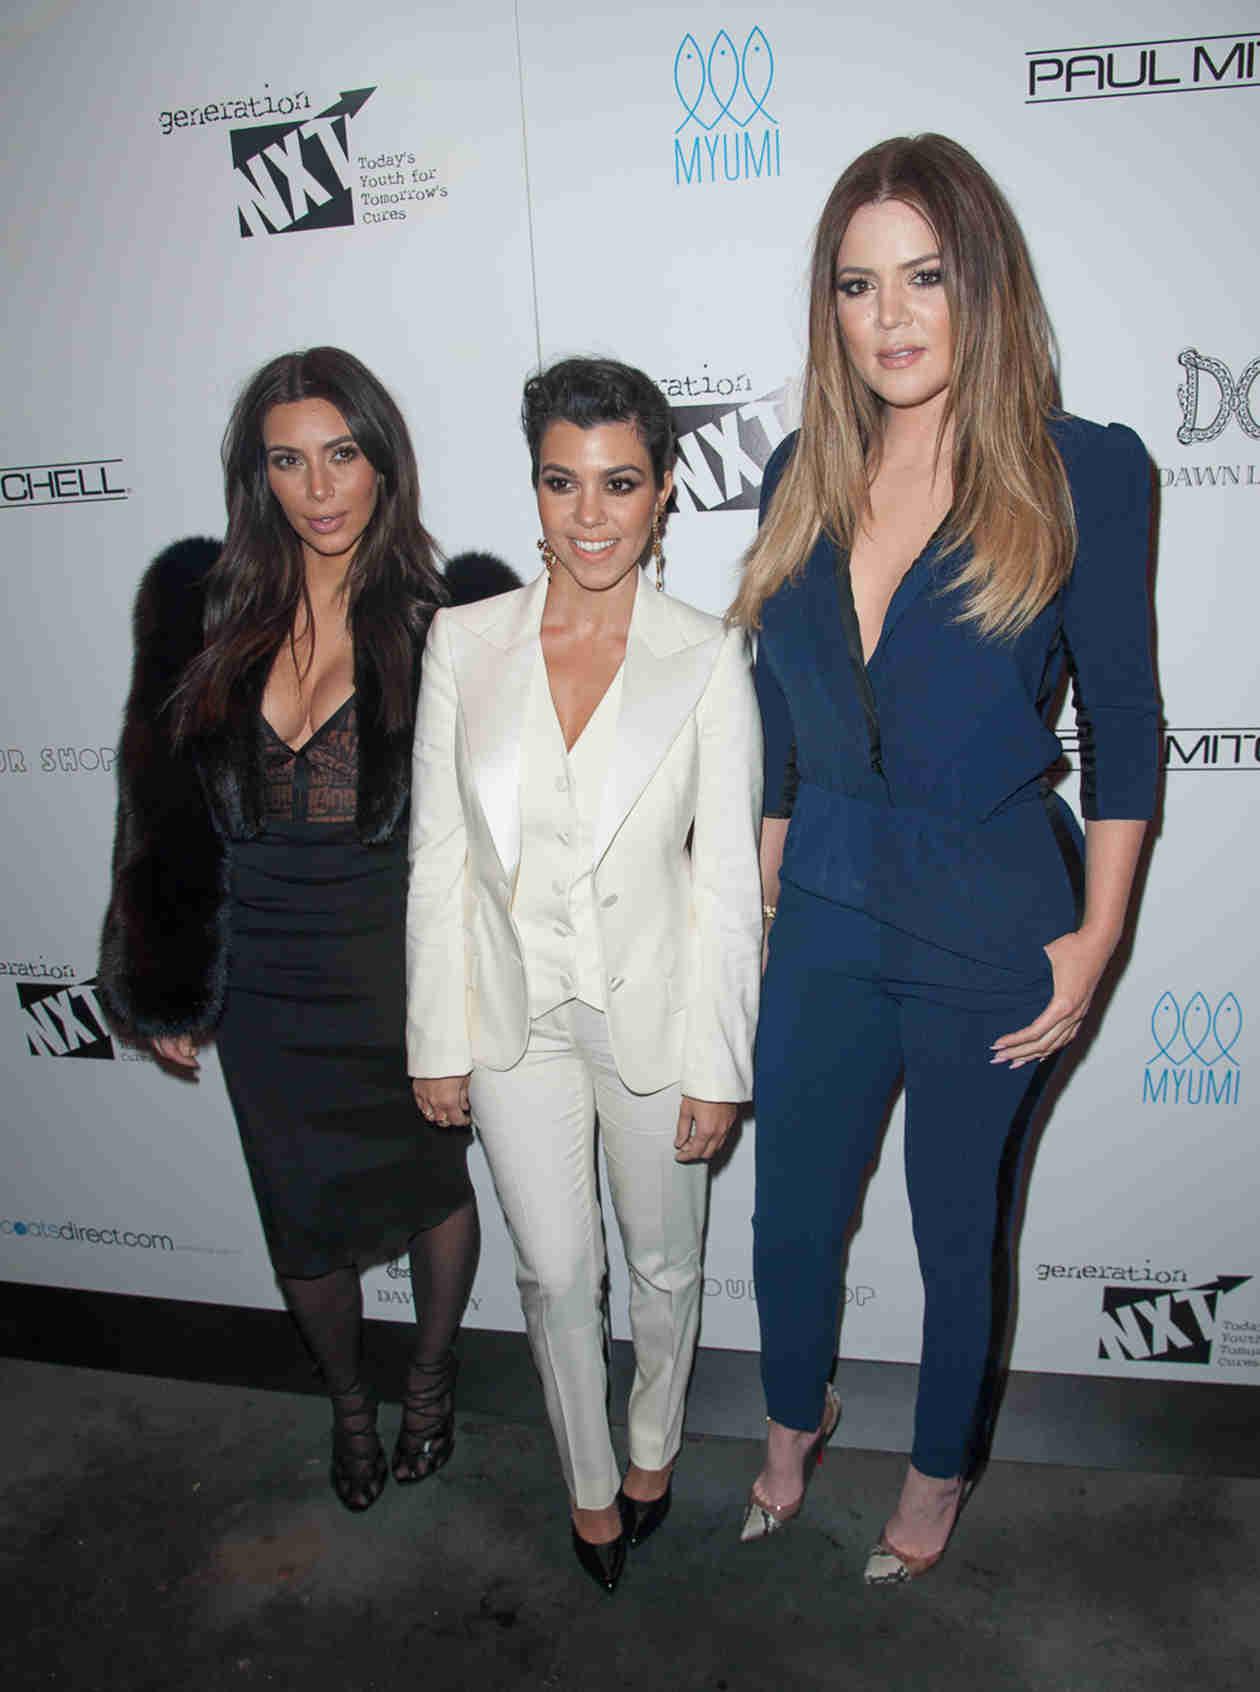 Kourtney and Khloe Kardashian Make Outrageous Demands in Hamptons — Report (VIDEO)